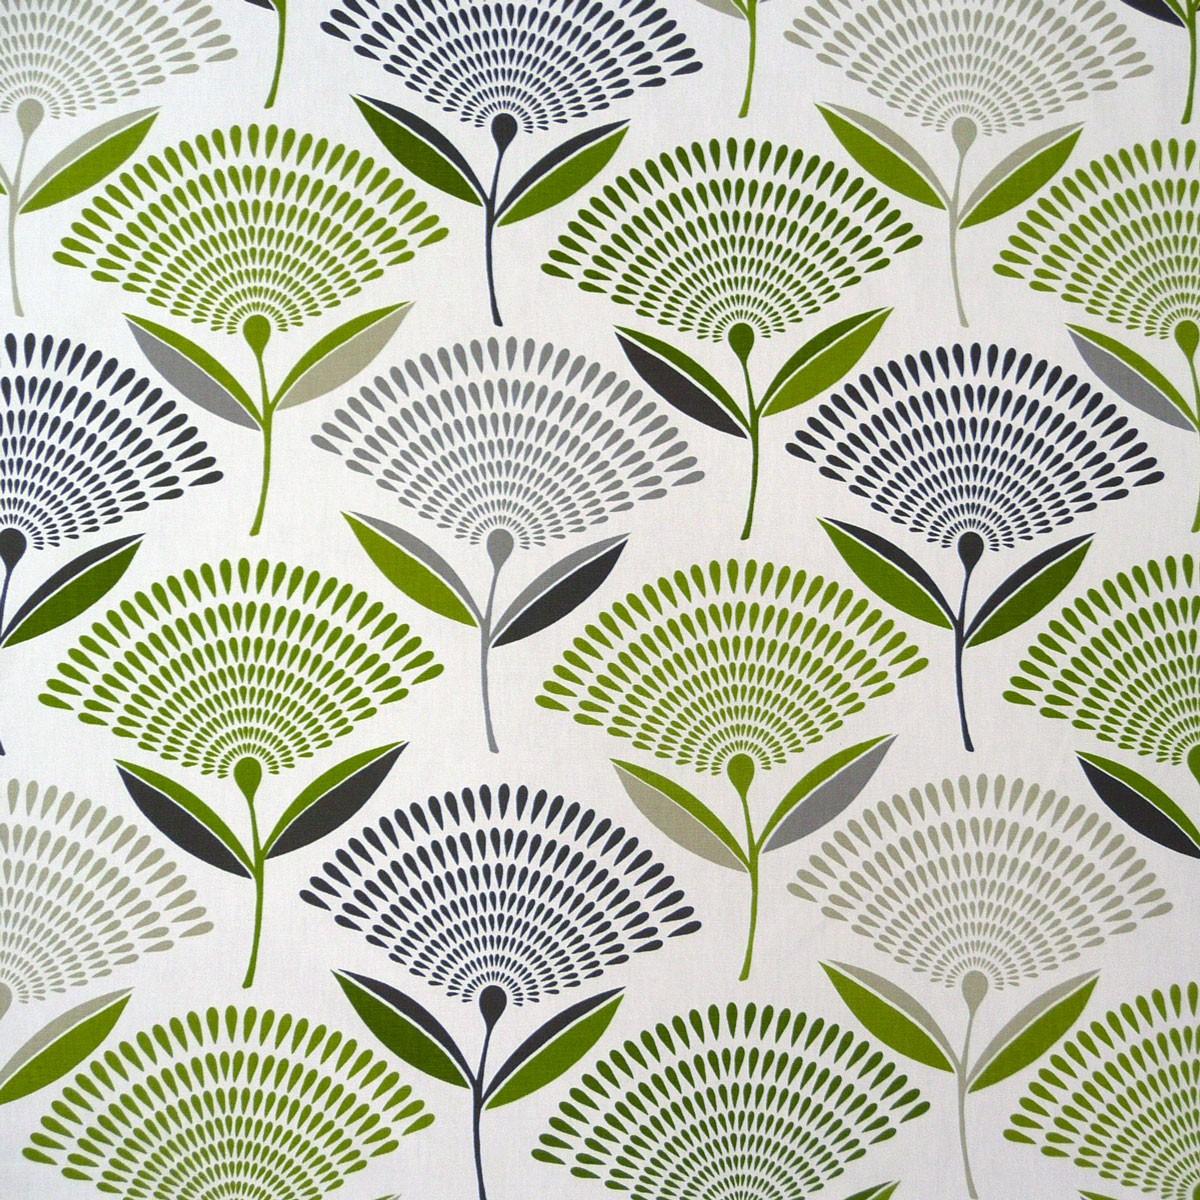 baumwollstoff blume bl te dandelion eucalyptus gr n braun dekostoff gardinenstoff stoffe stoffe. Black Bedroom Furniture Sets. Home Design Ideas